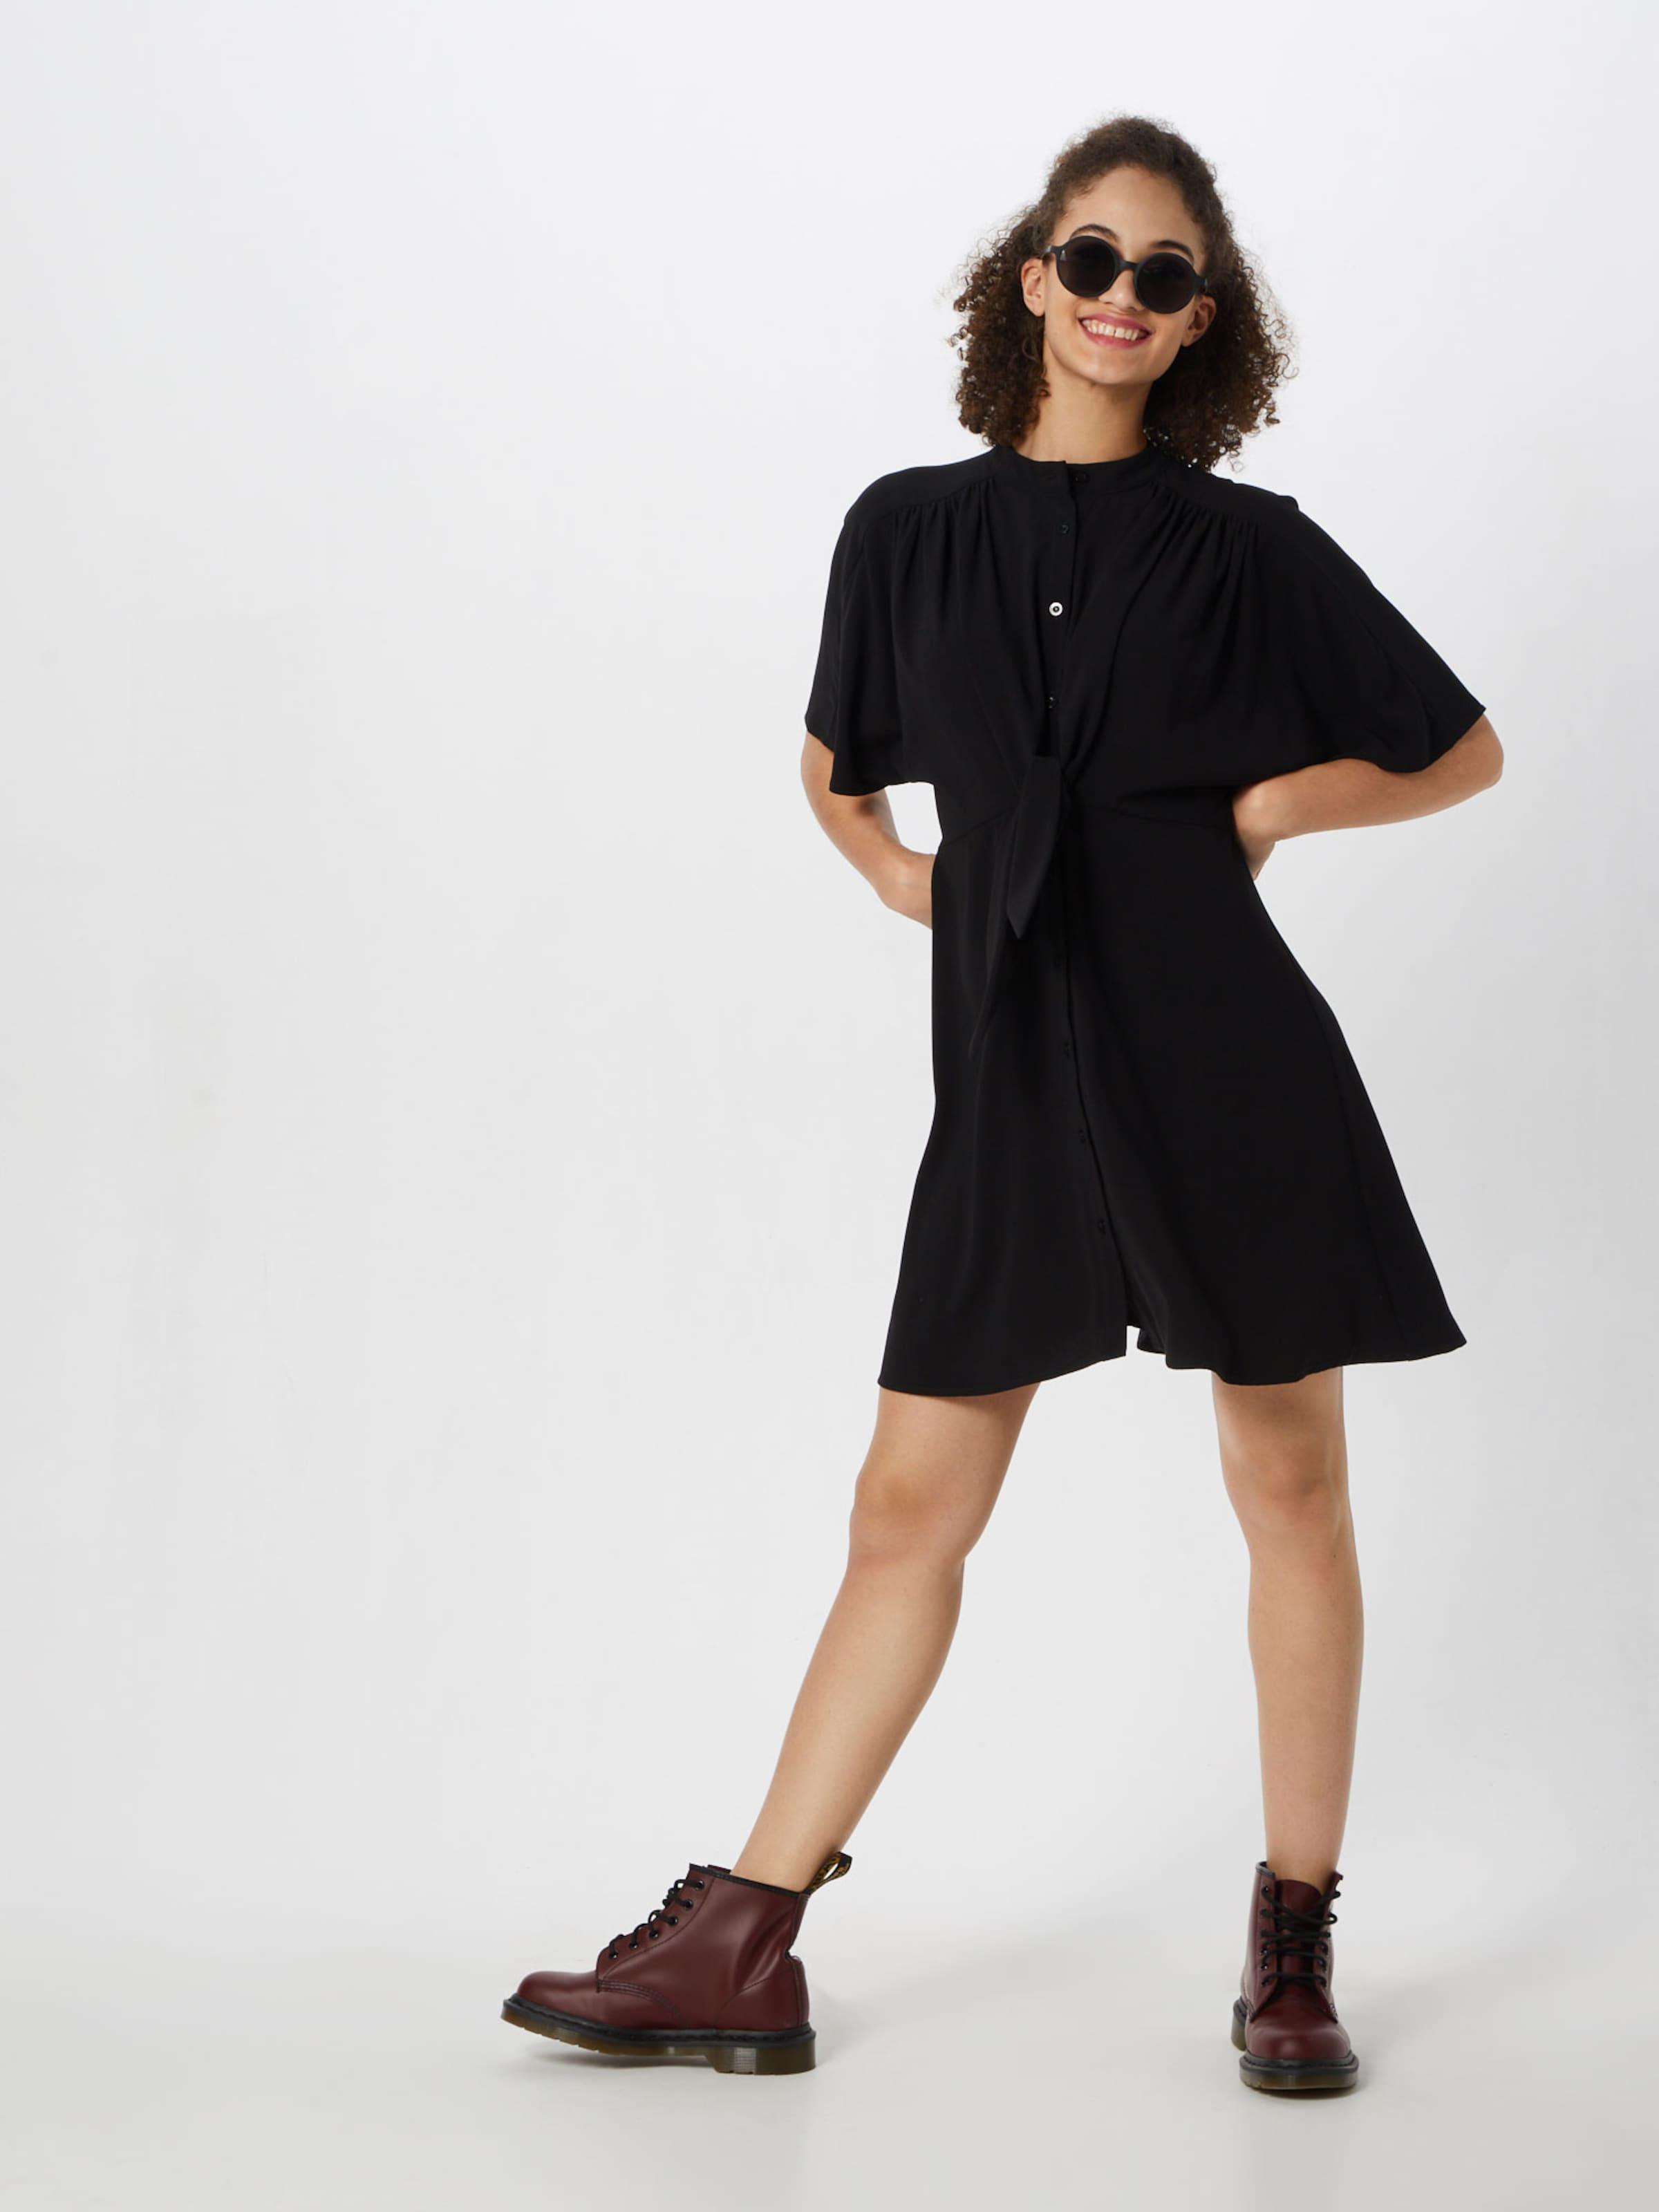 'tishoo' Fashion Union Kleid Schwarz In O0vmNw8n